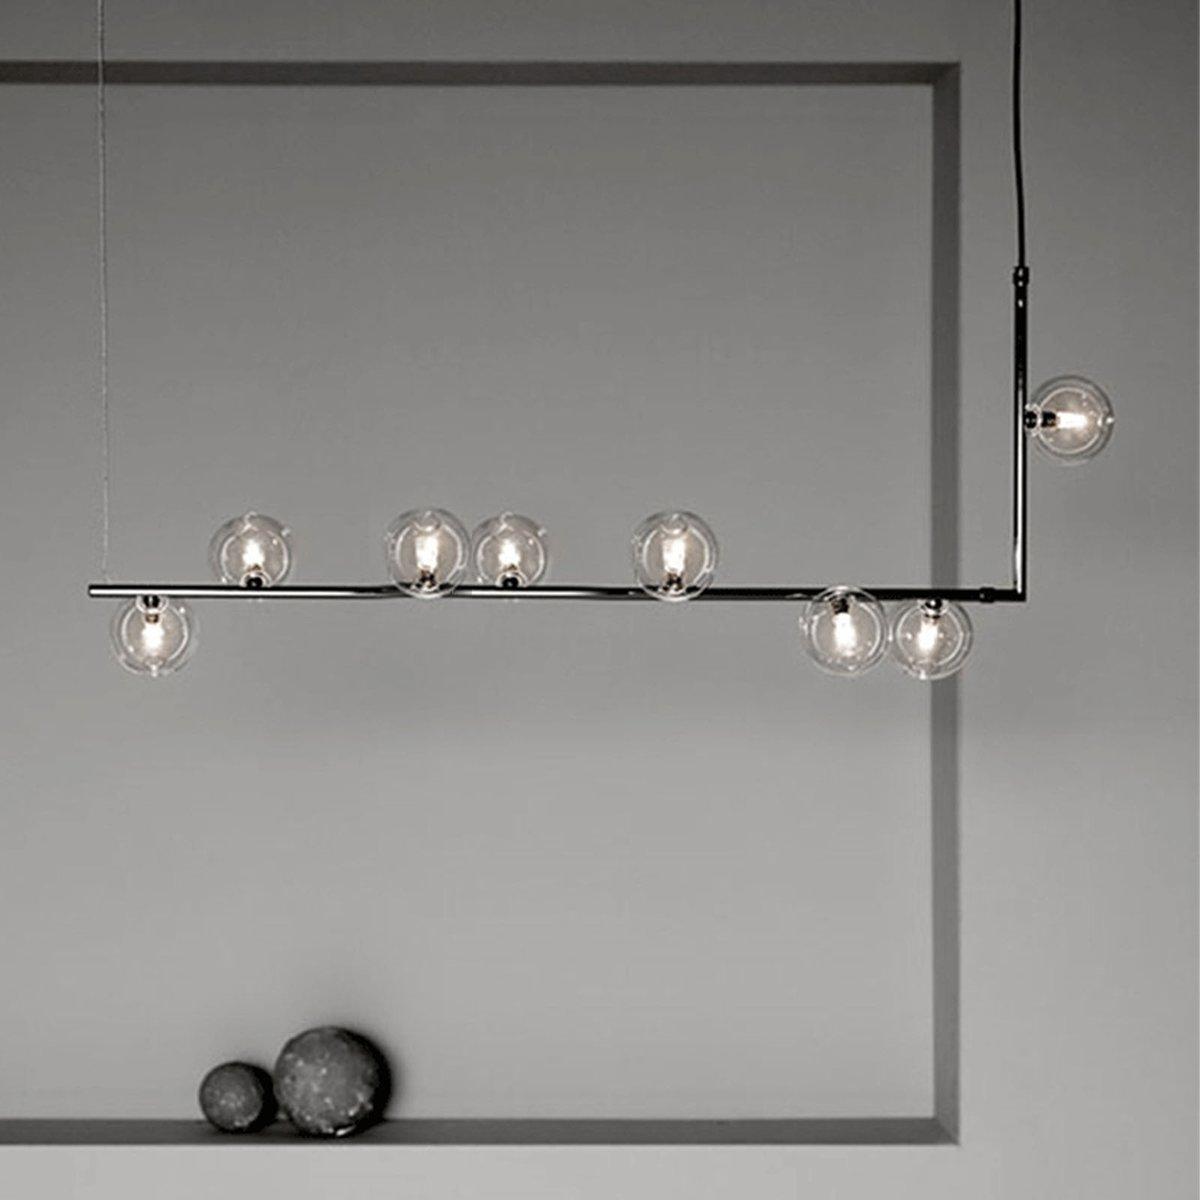 Uppsala 8 Heads Pendant Lamp Cy New 026 8 Ch Pendant Lamp G9 Led Bulb Wooden Chandelier